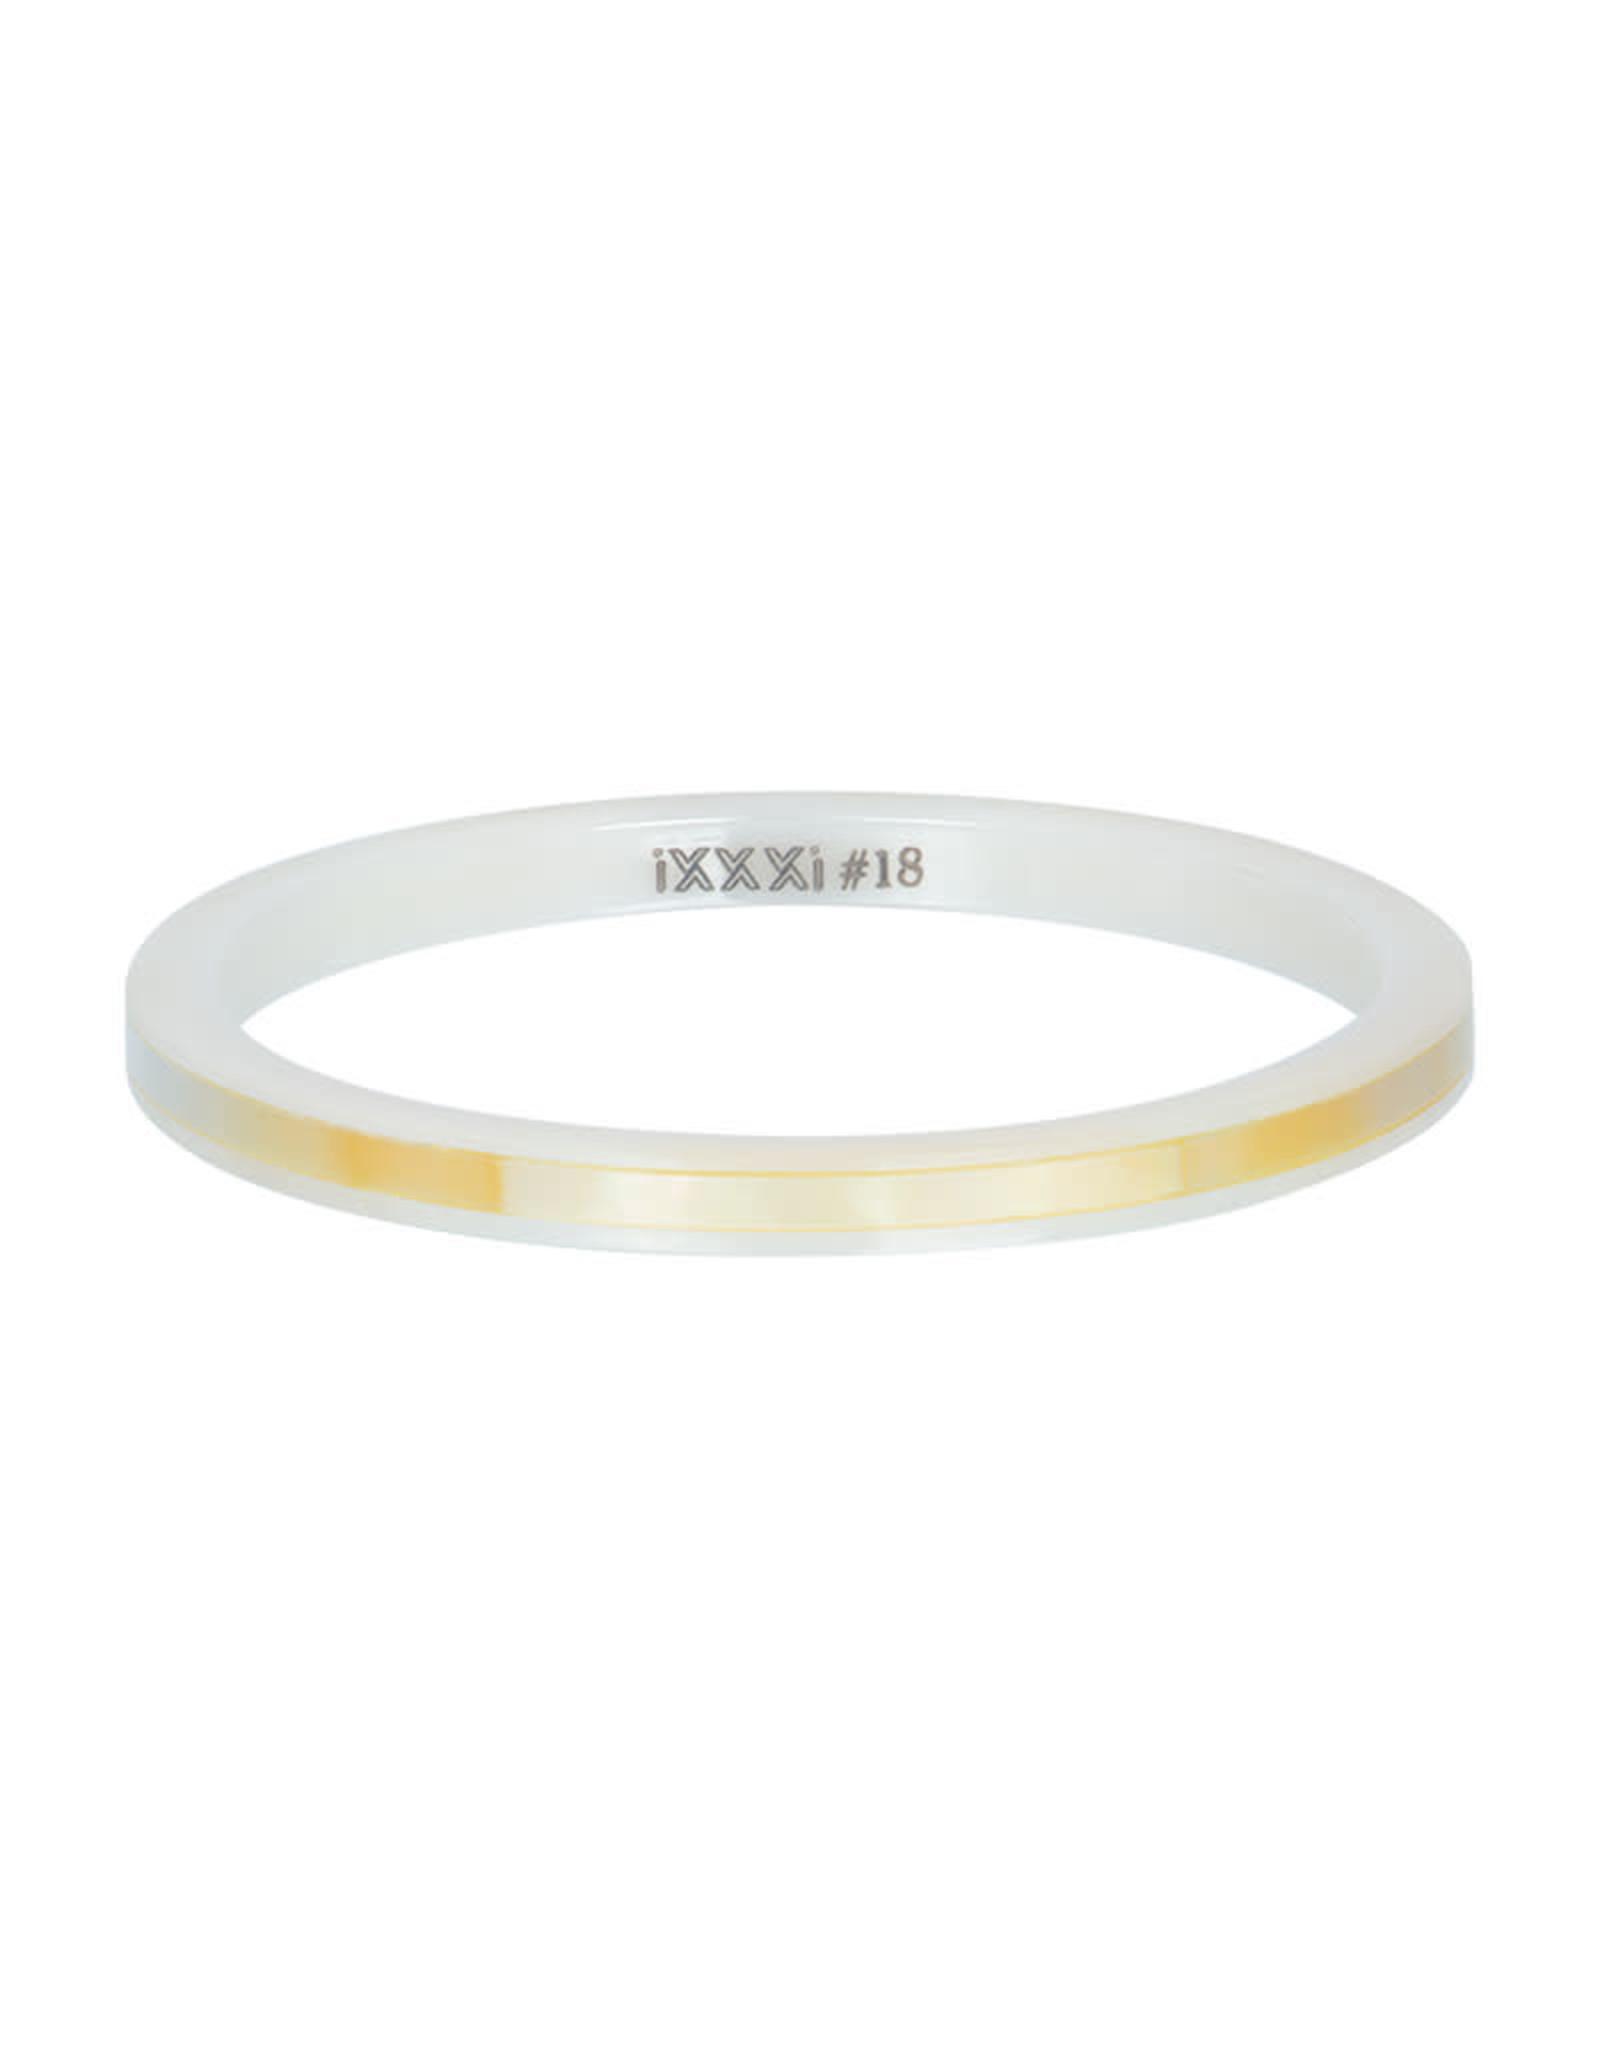 iXXXi ringen iXXXi ceramic yellow shell 2mm